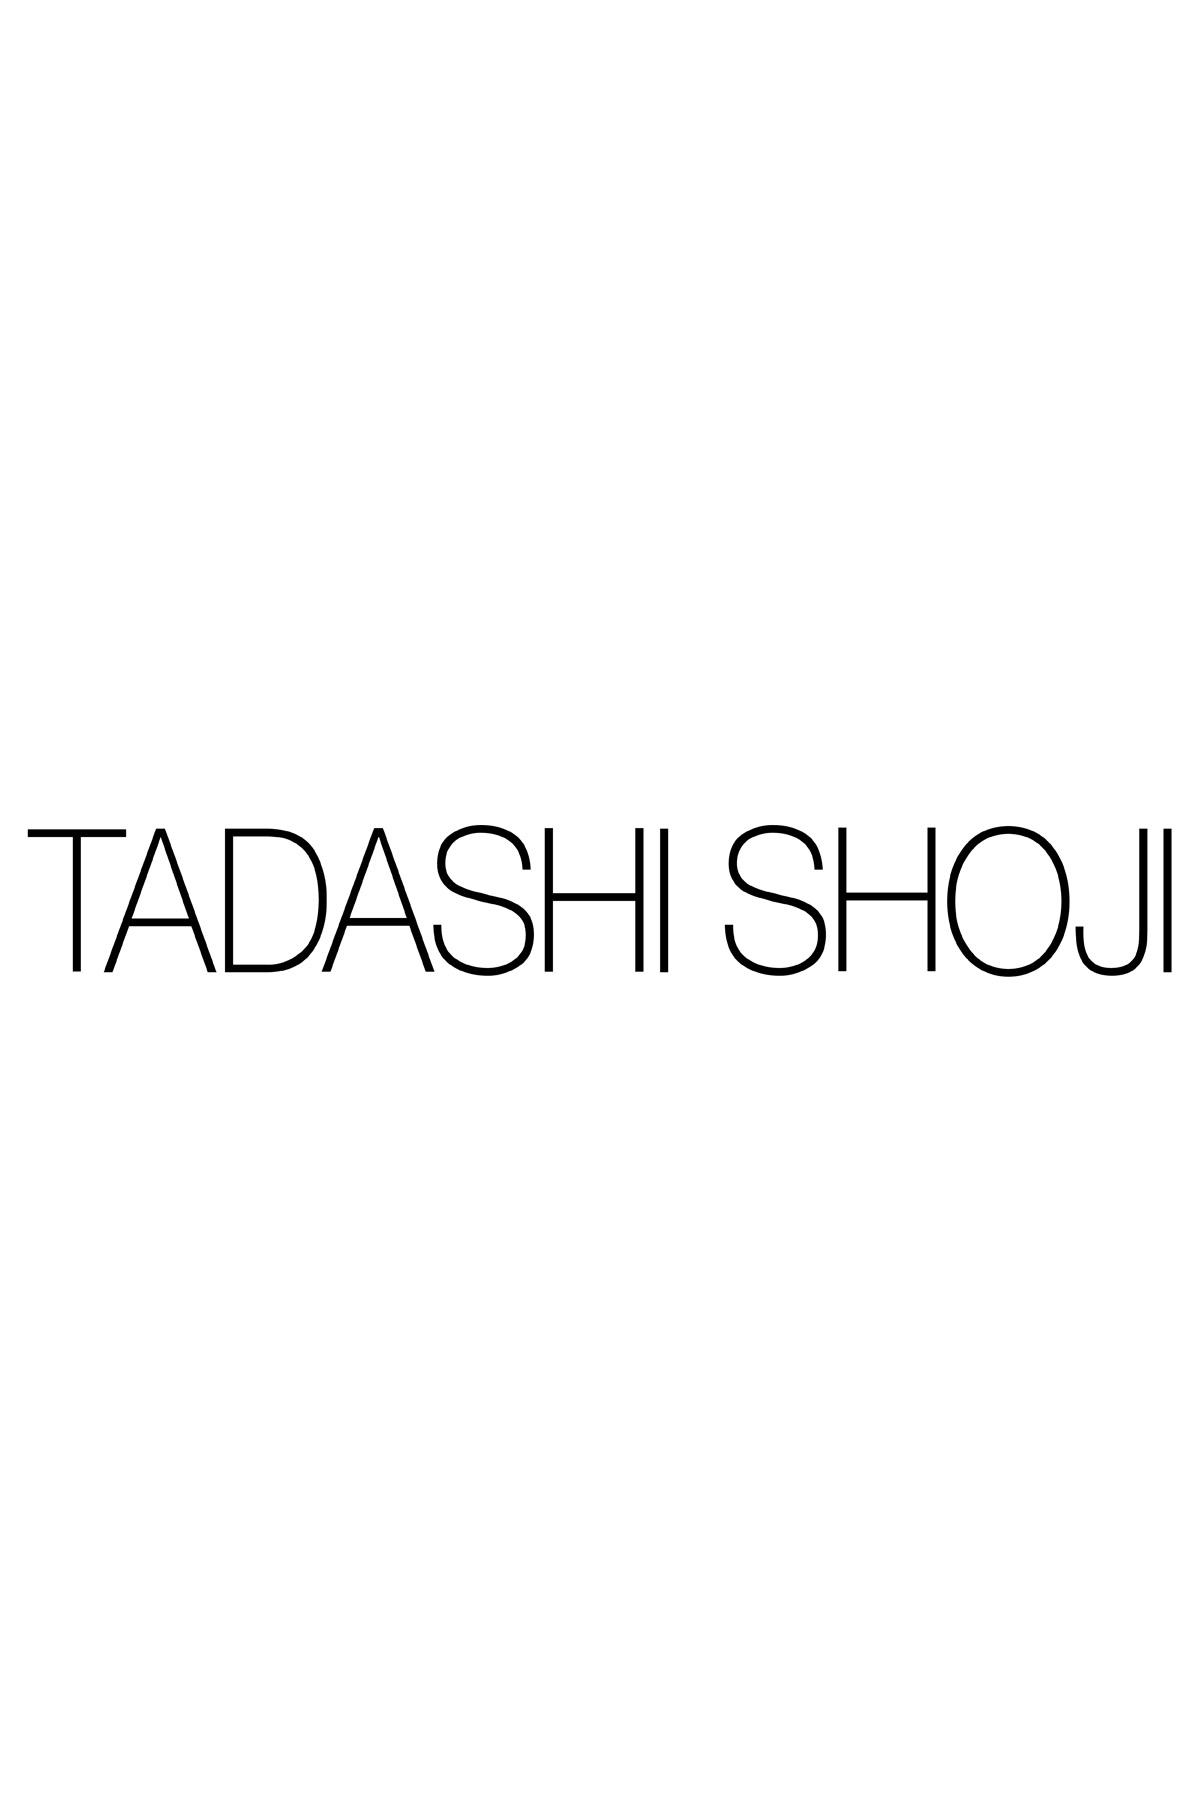 Tadashi Shoji - Karelo Ruffled Crepe Dress - PETITE